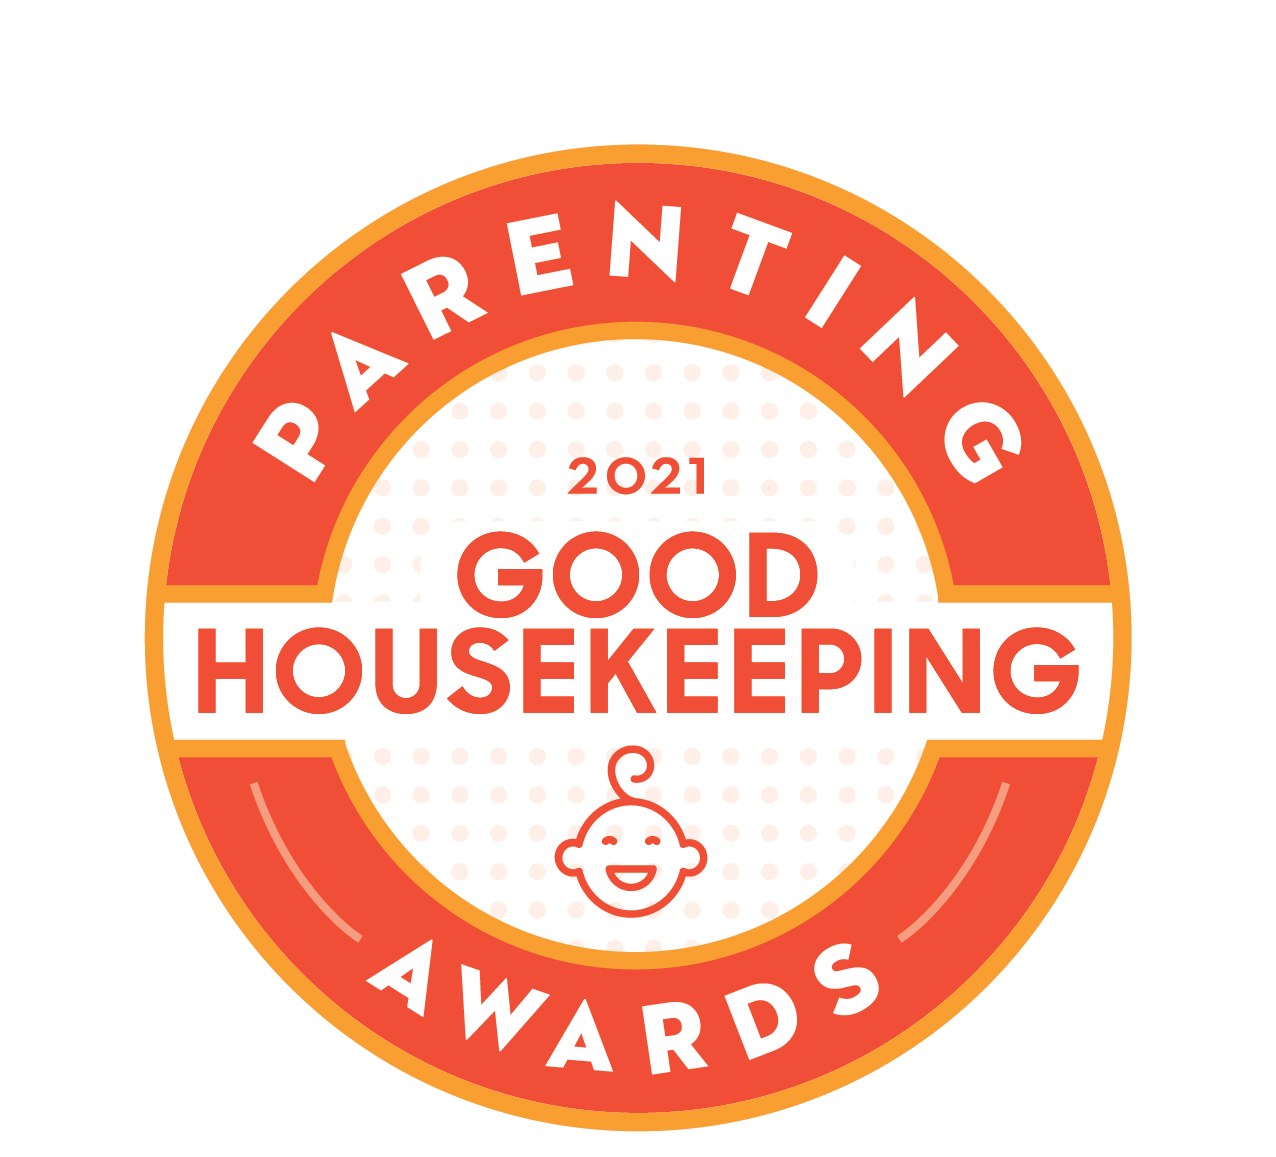 Good Housekeeping Parenting Award